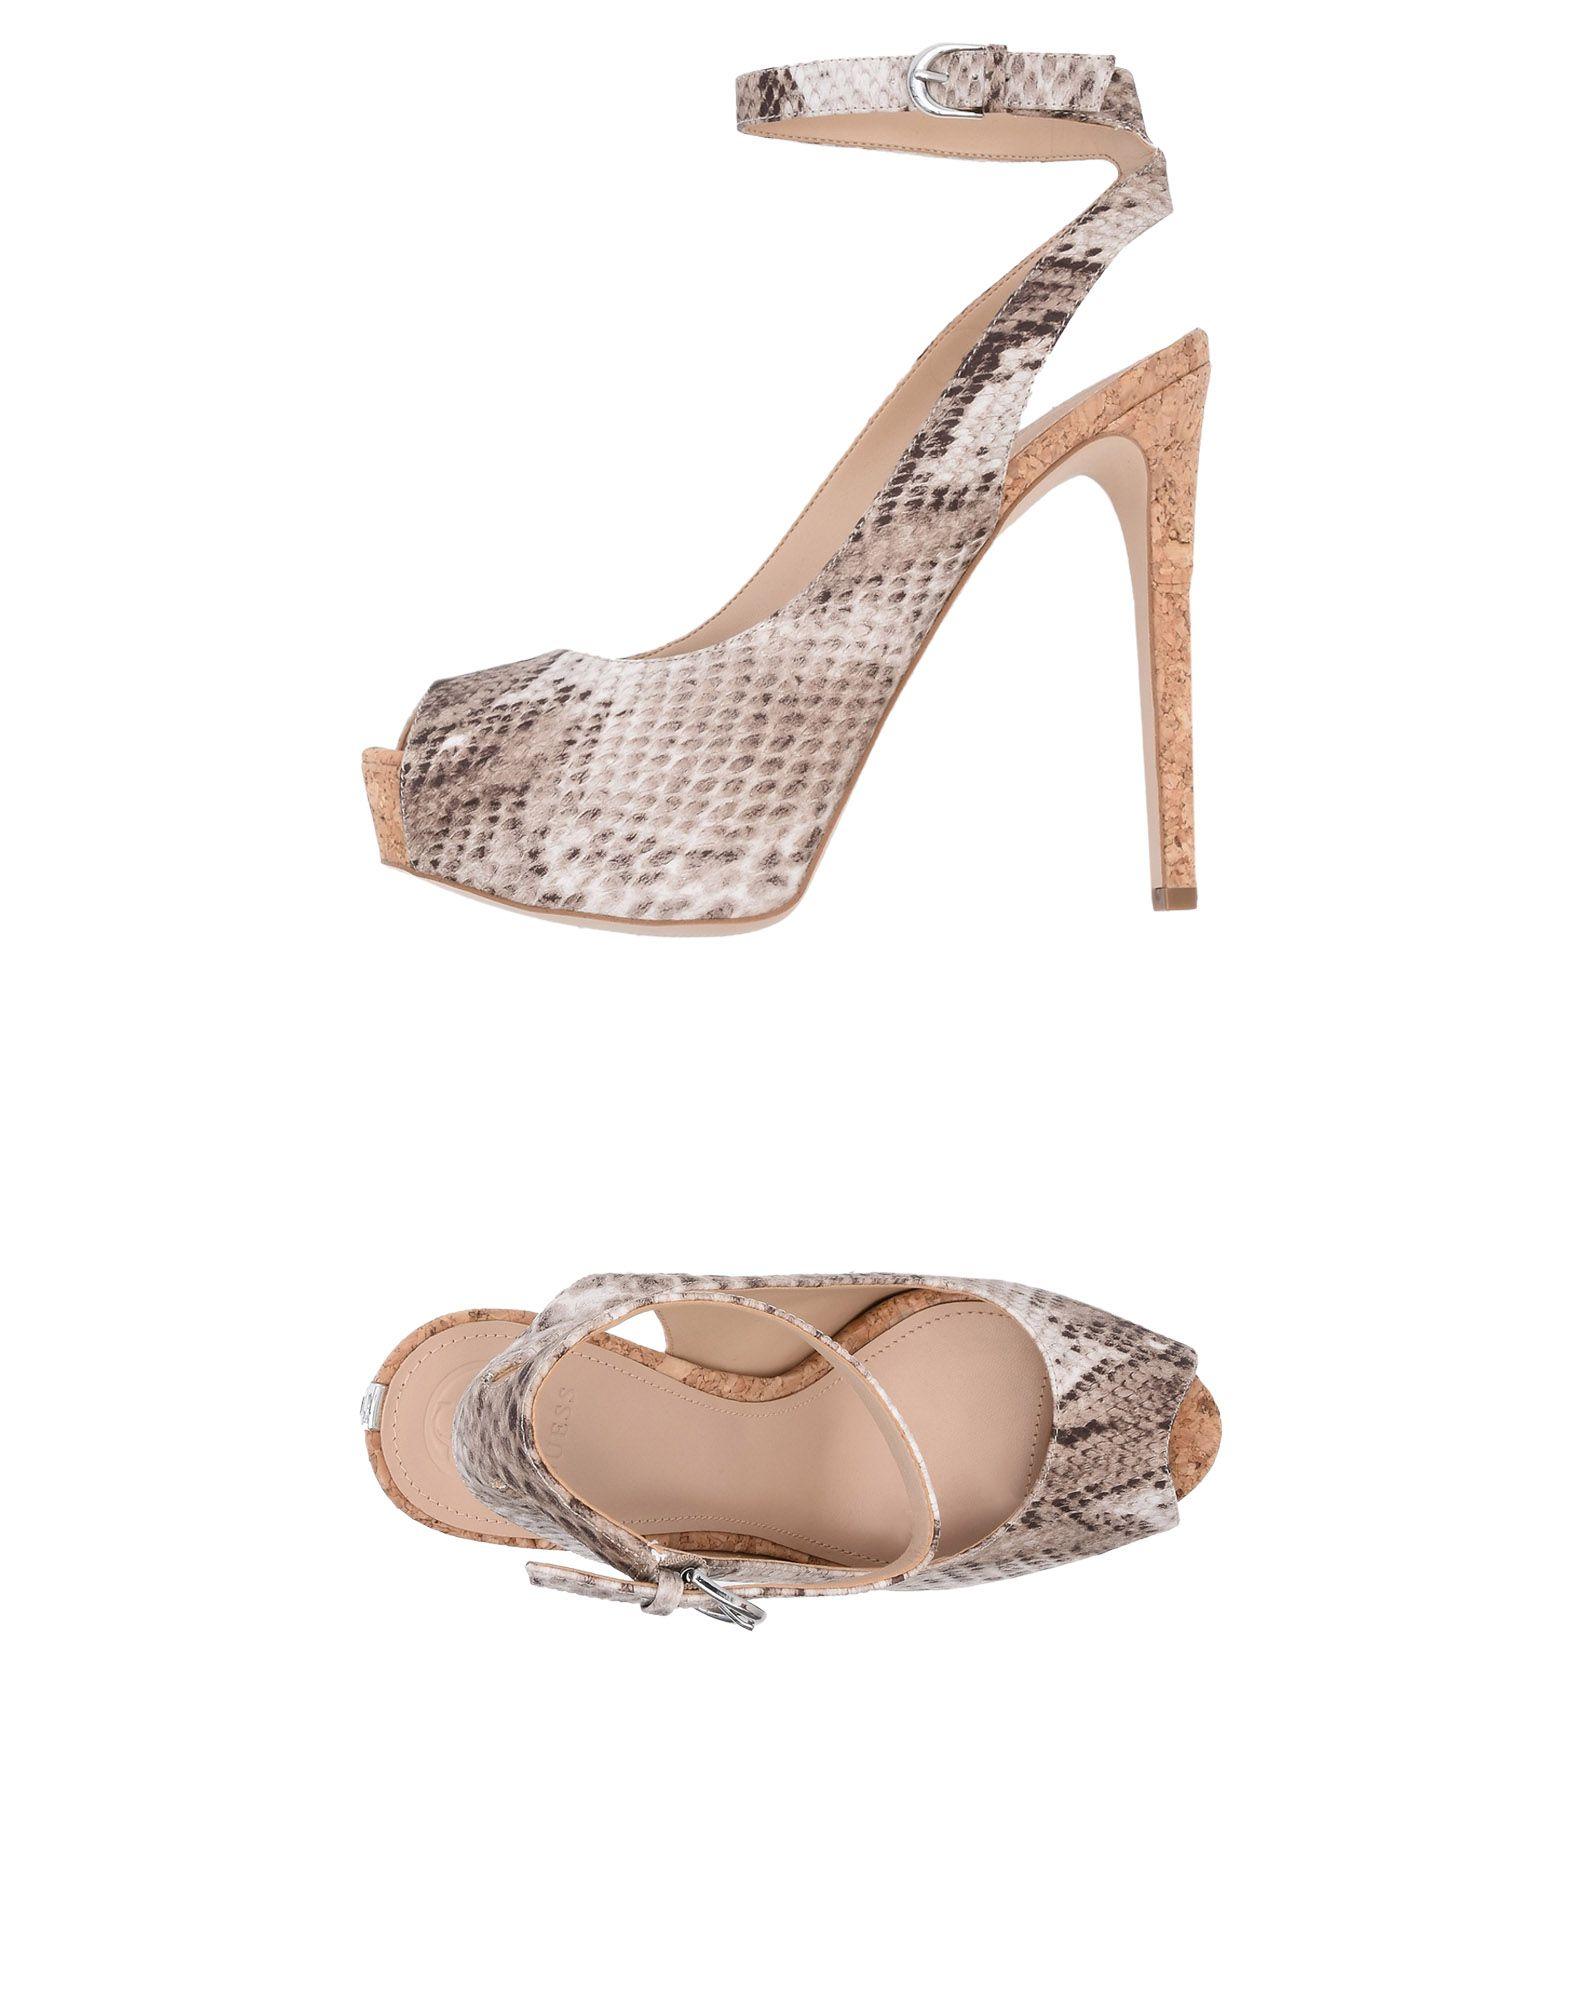 Guess Sandals Sandals - Women Guess Sandals Guess online on  United Kingdom - 11493257JI aa5861